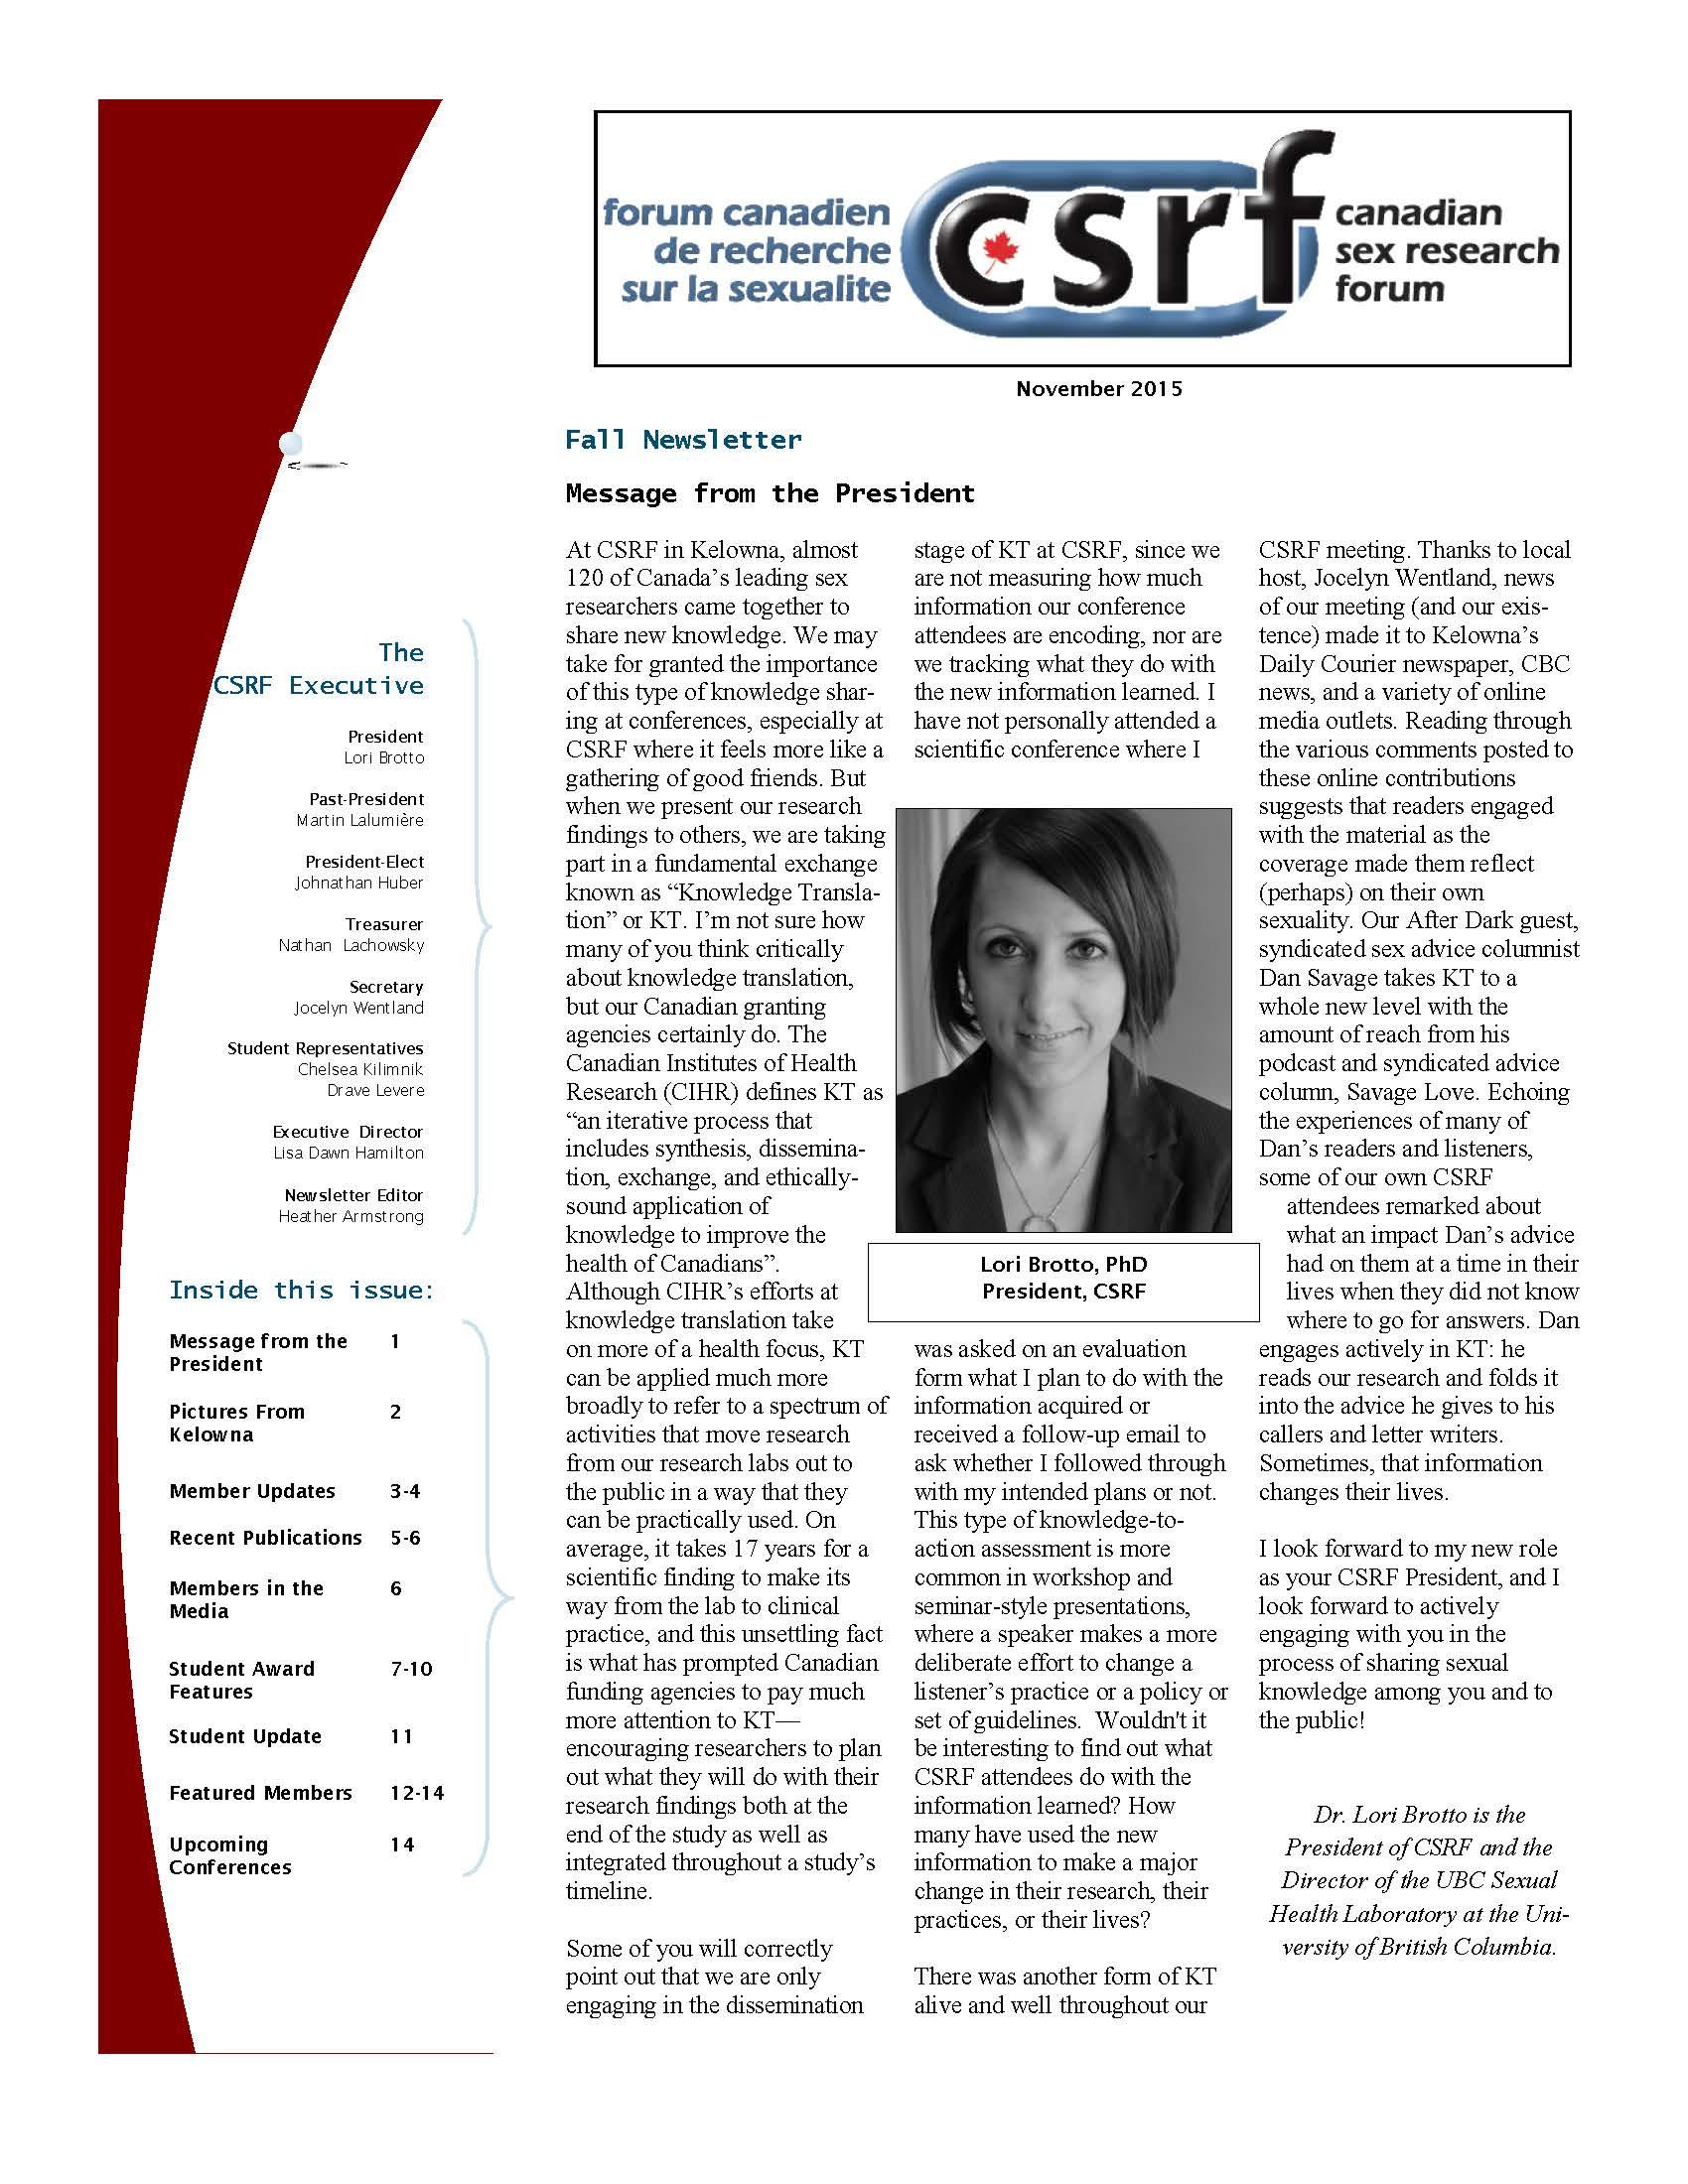 CSRF Fall Newsletter 2015_Page_01.jpg